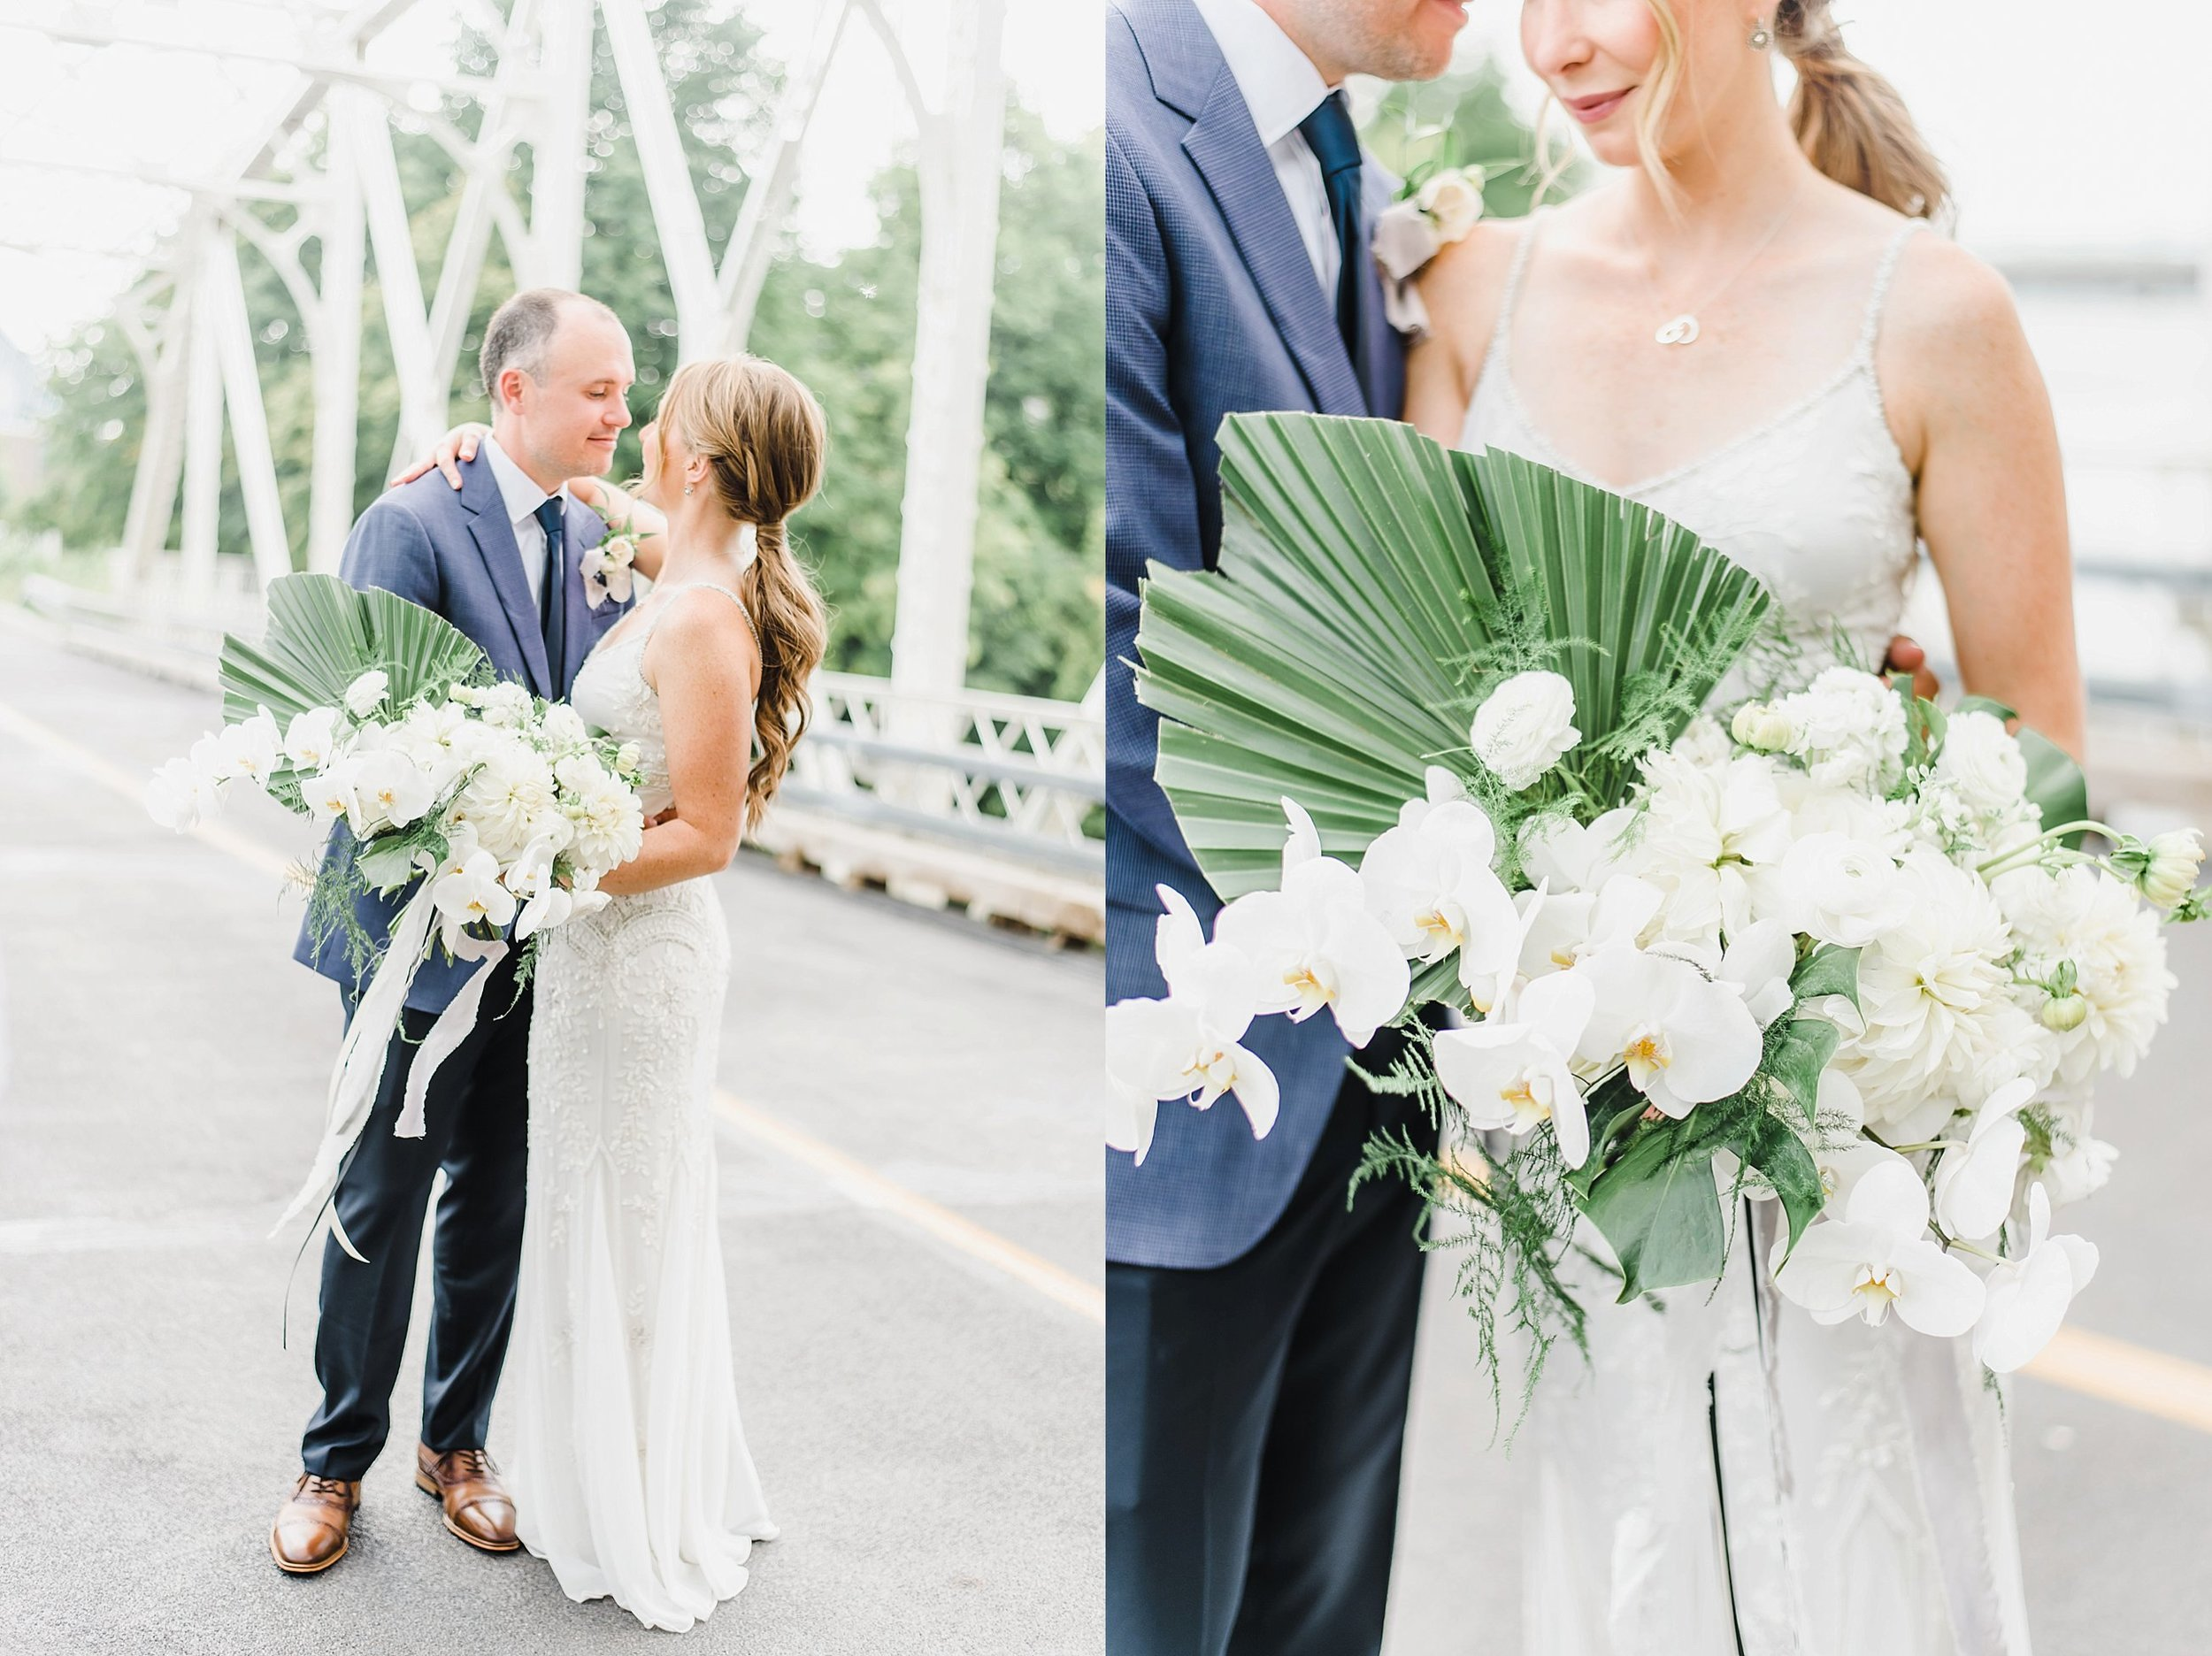 light airy indie fine art ottawa wedding photographer | Ali and Batoul Photography_0636.jpg